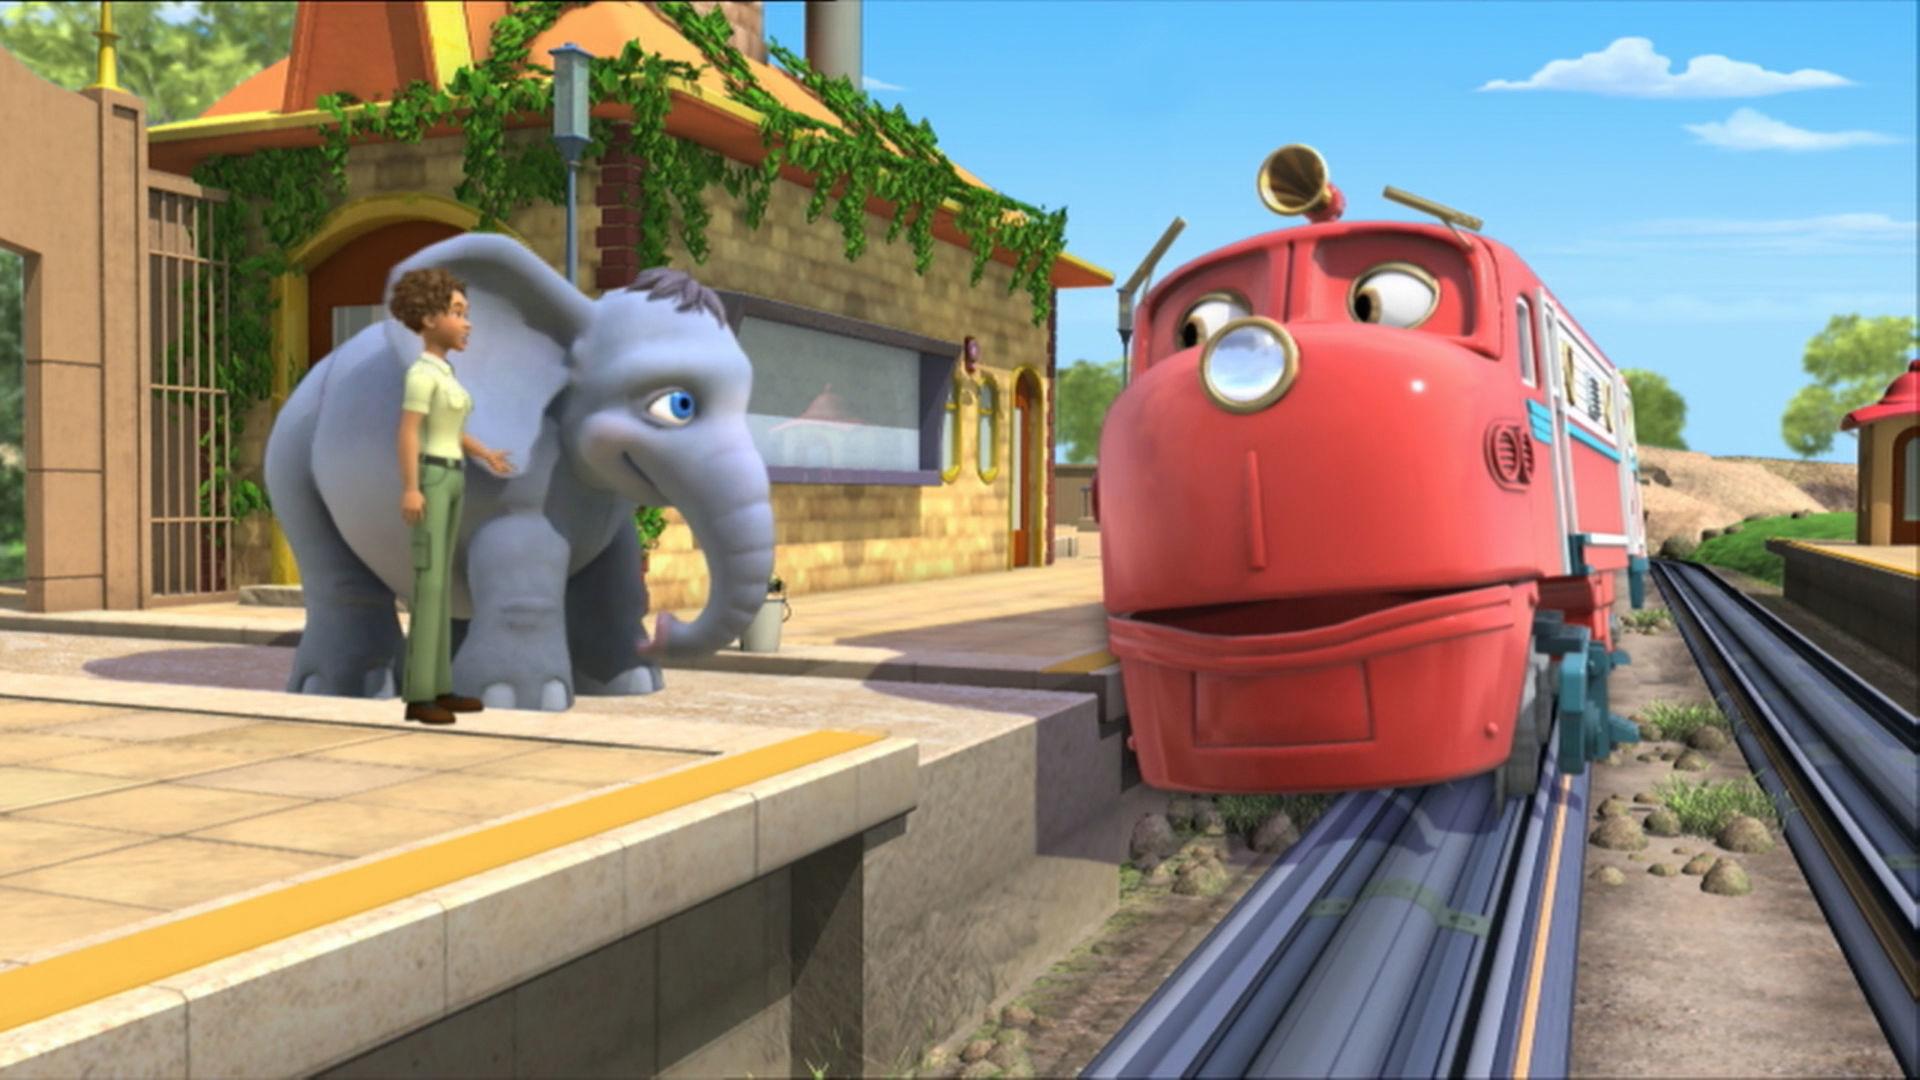 Wilson and the Elephant / Koko and the Tunnel